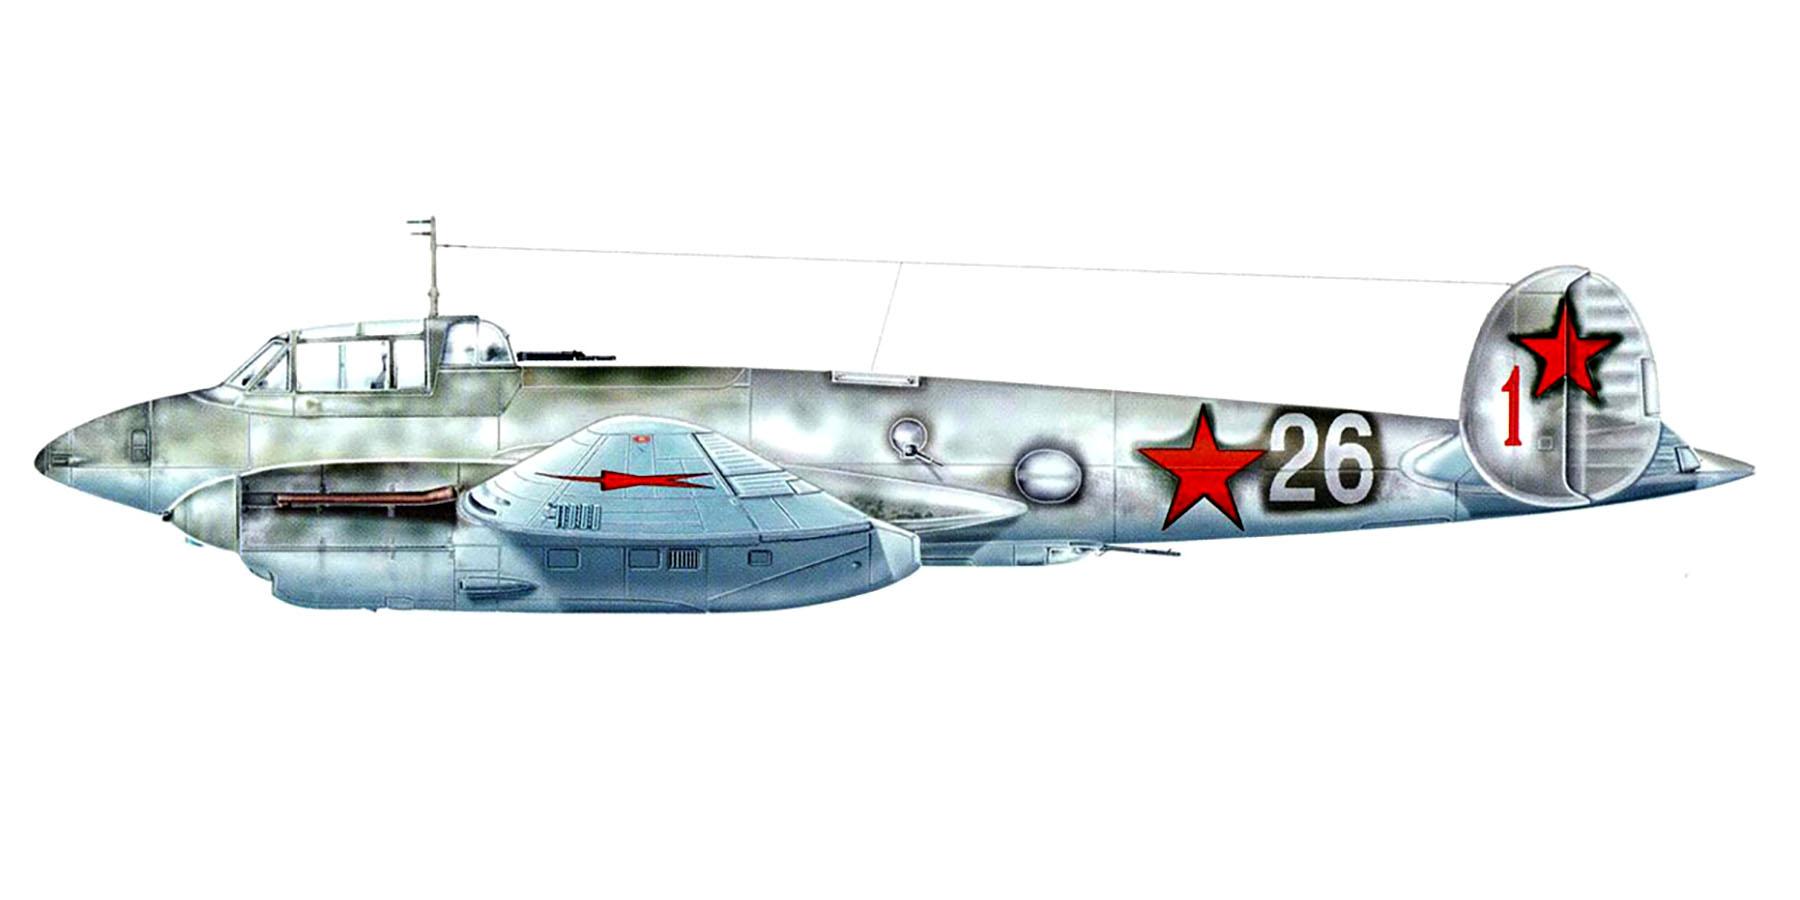 Petlyakov Pe 2 29BAR White 26 Kirkenes 1943 0A